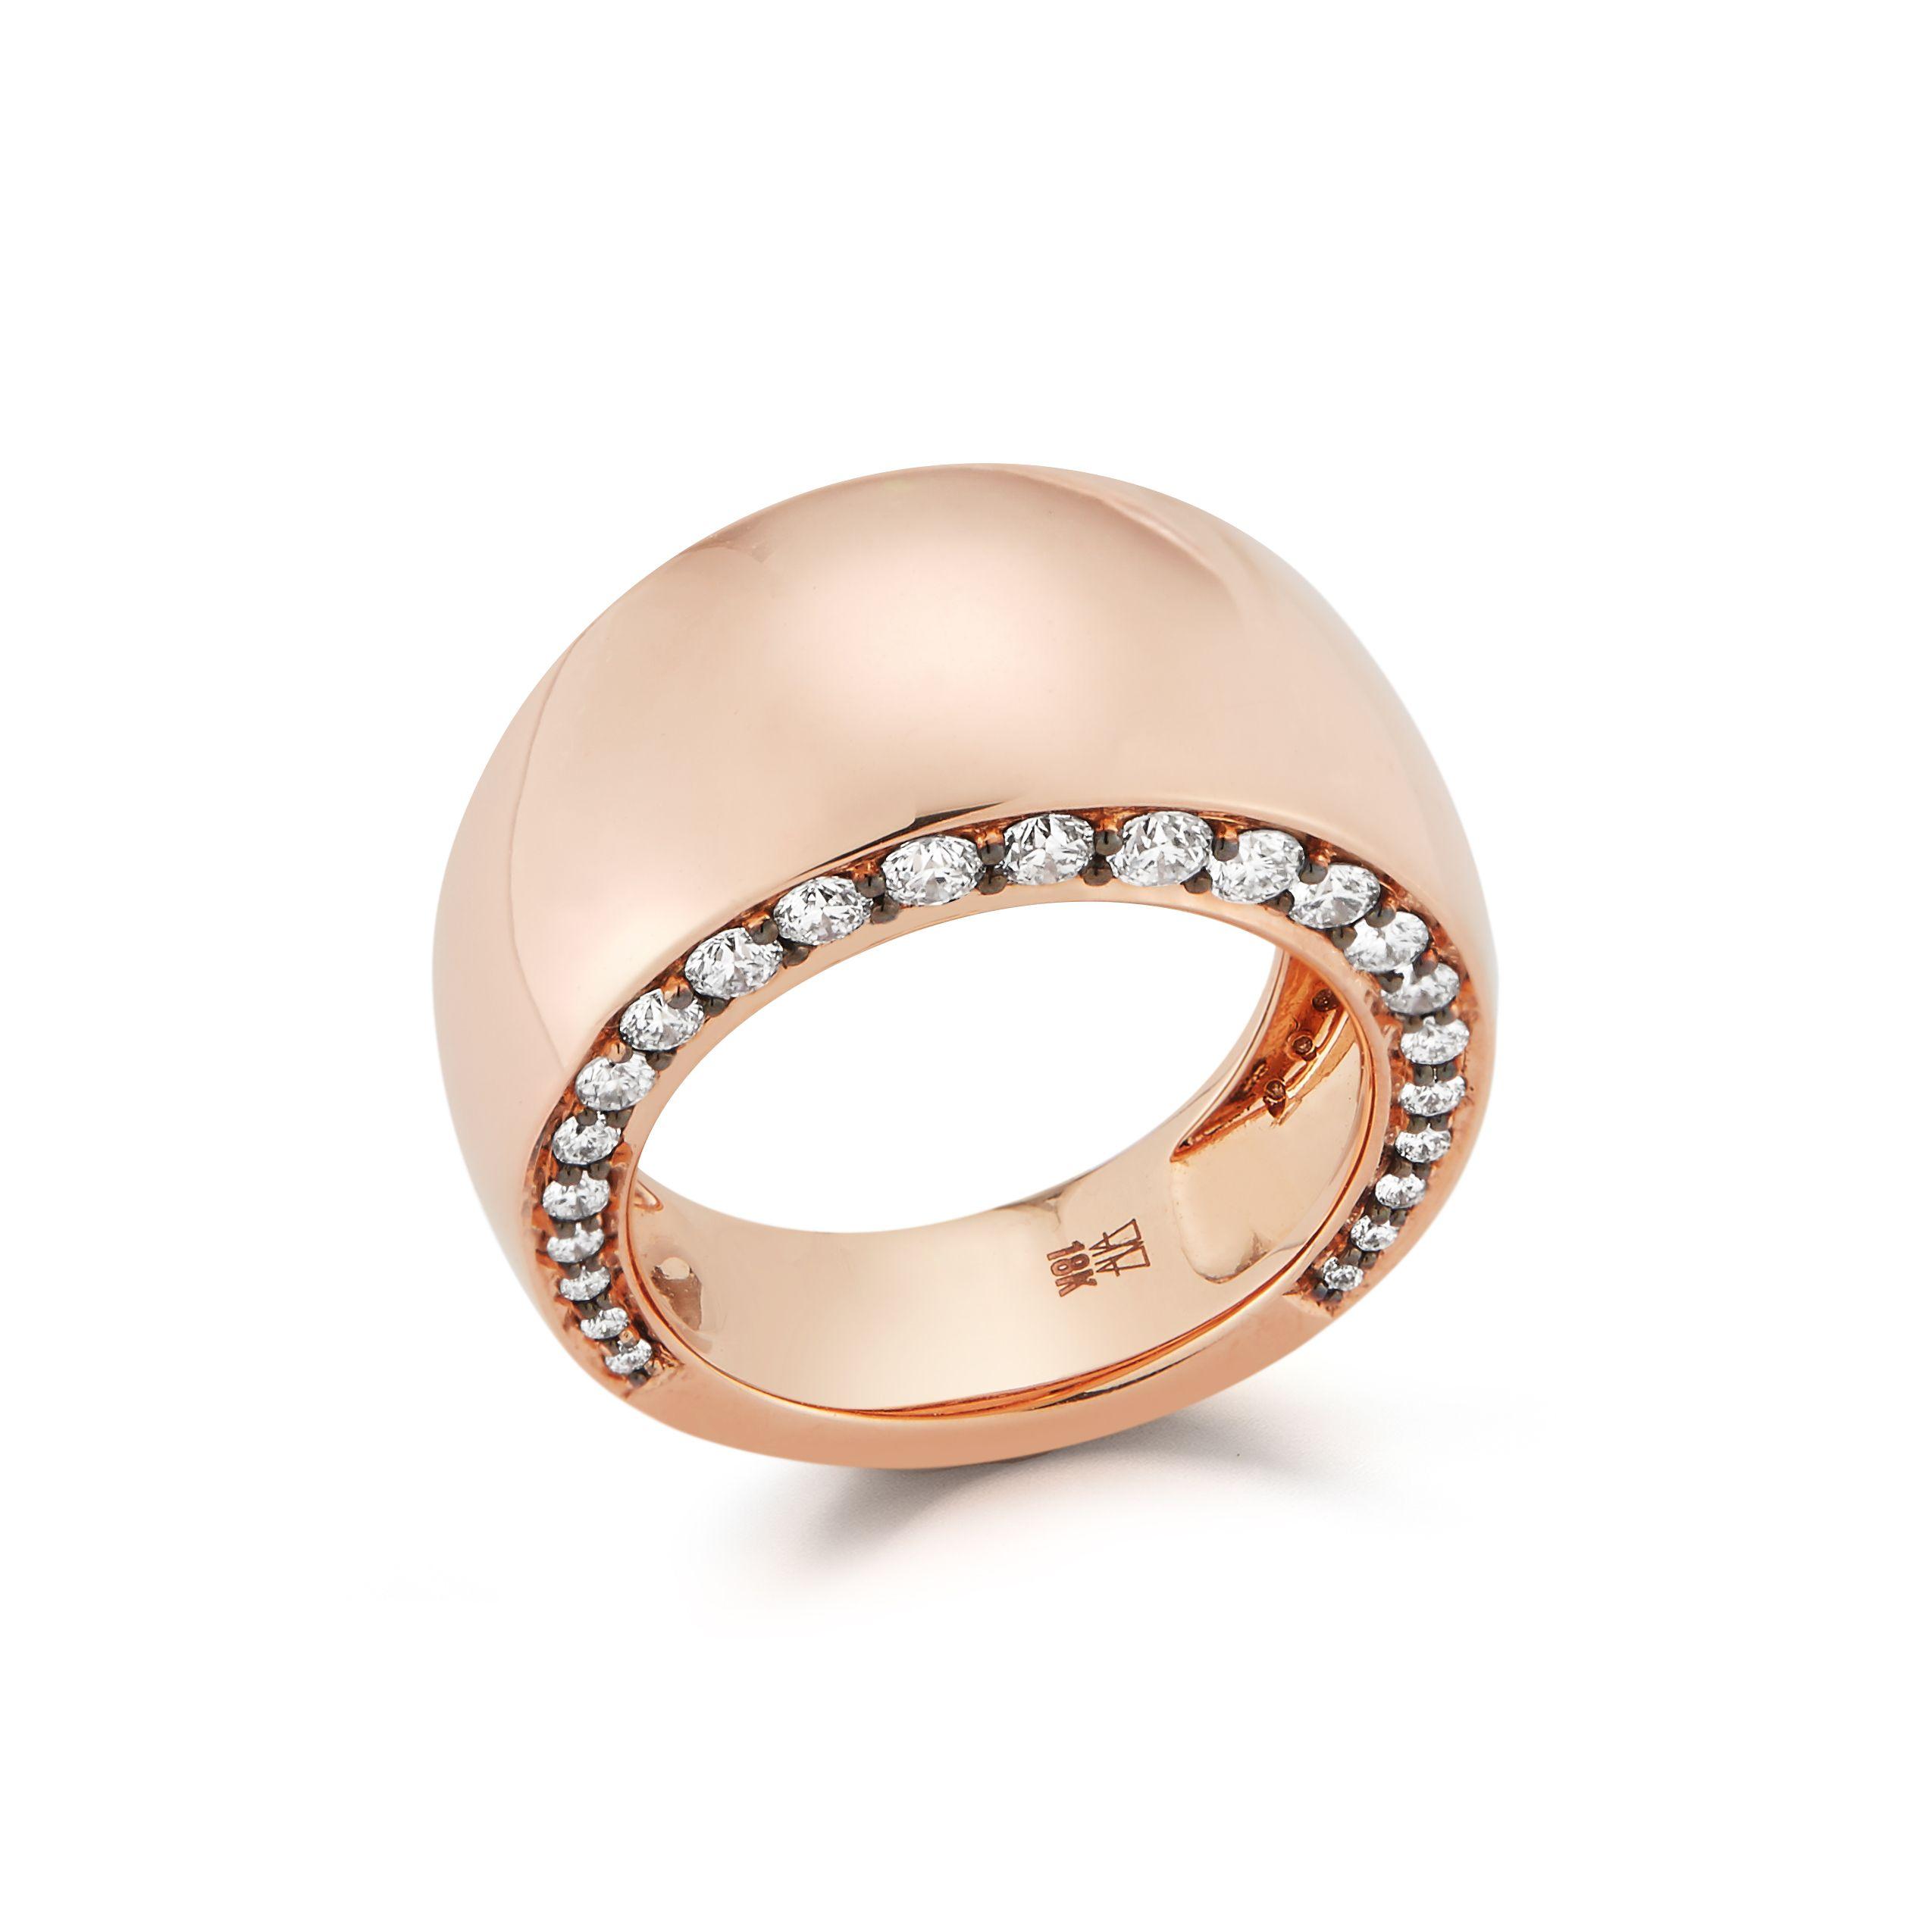 Walters Faith Ottoline 18K Rose Gold And Diamond Baguette Ring X9FtxPref